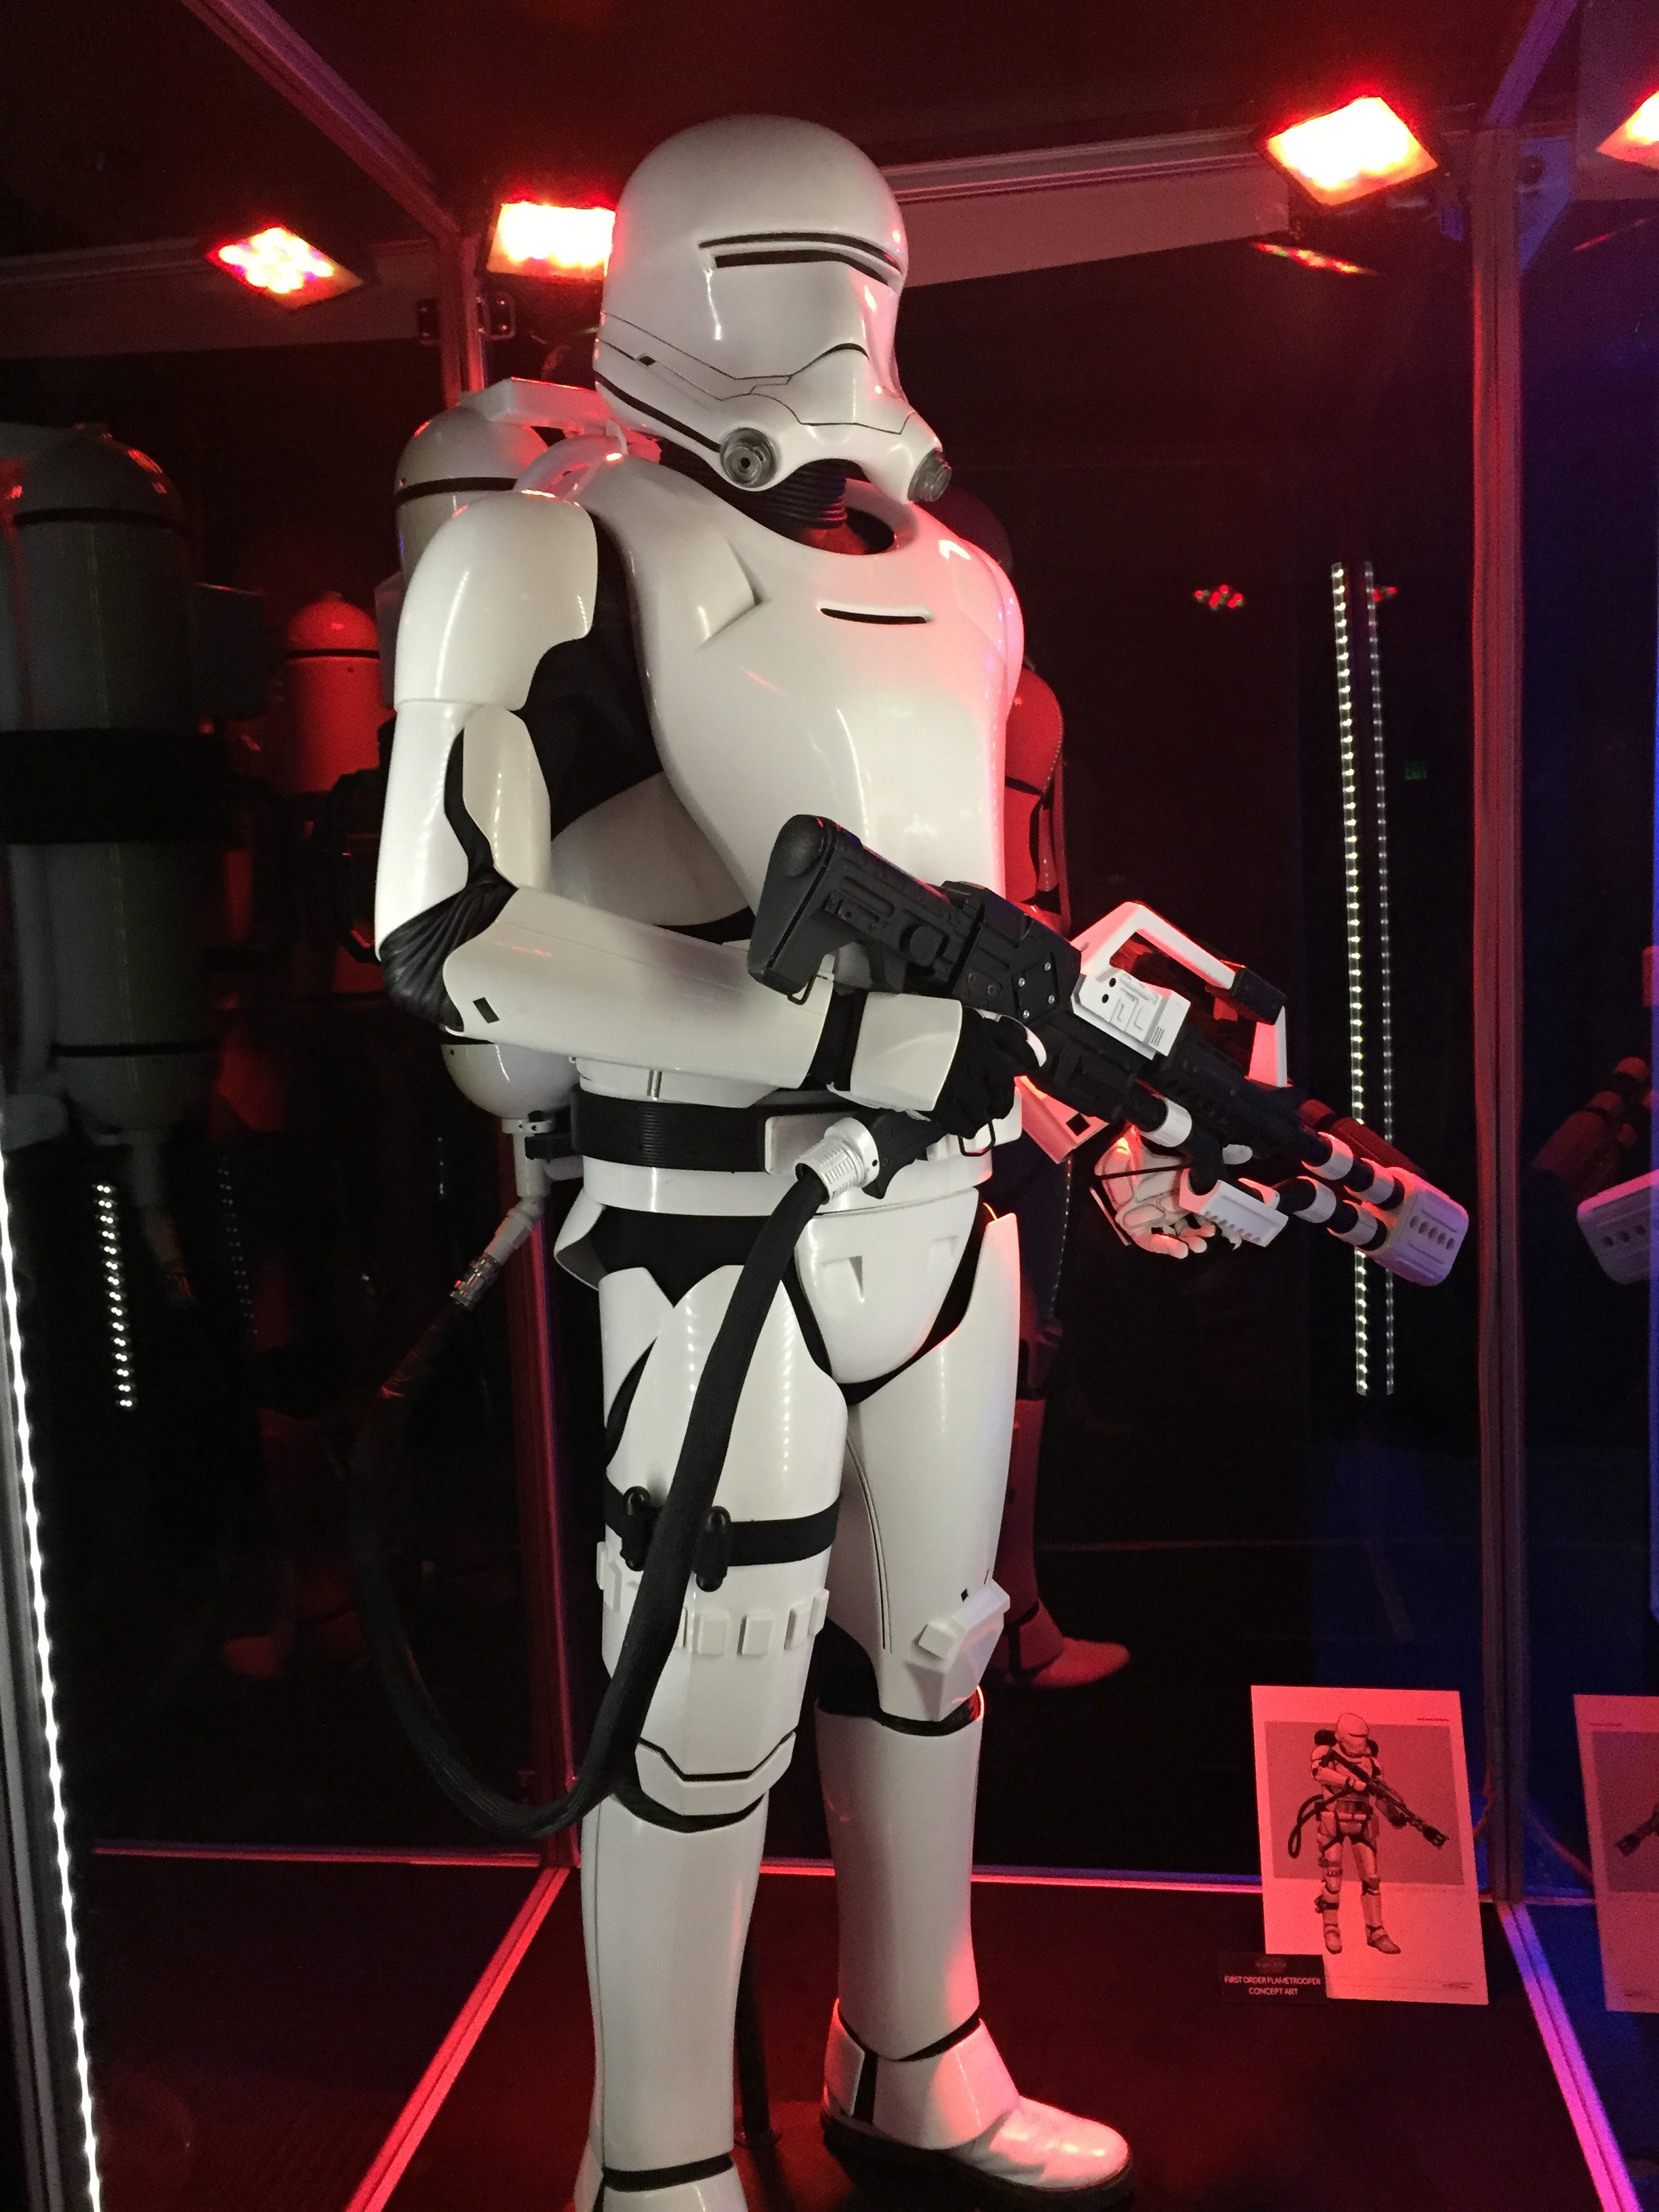 Force Awakens Exhibit  - 68.jpg